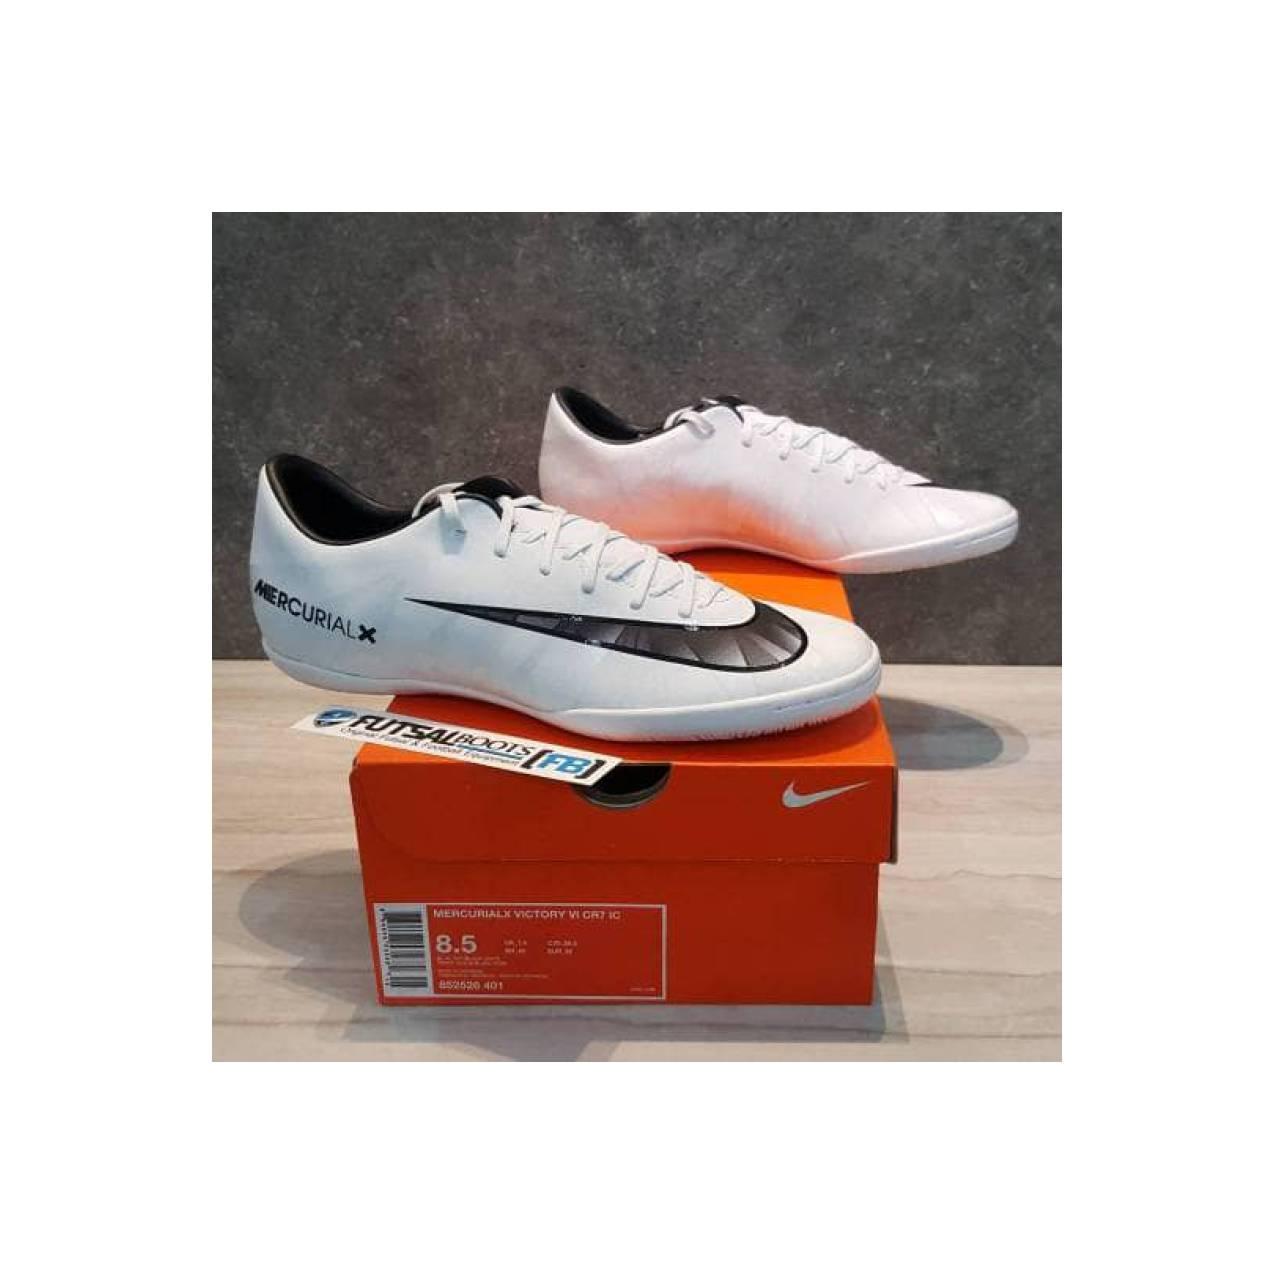 Sepatu Futsal Nike Mercurial X Victory CR7 Ronaldo IC - White